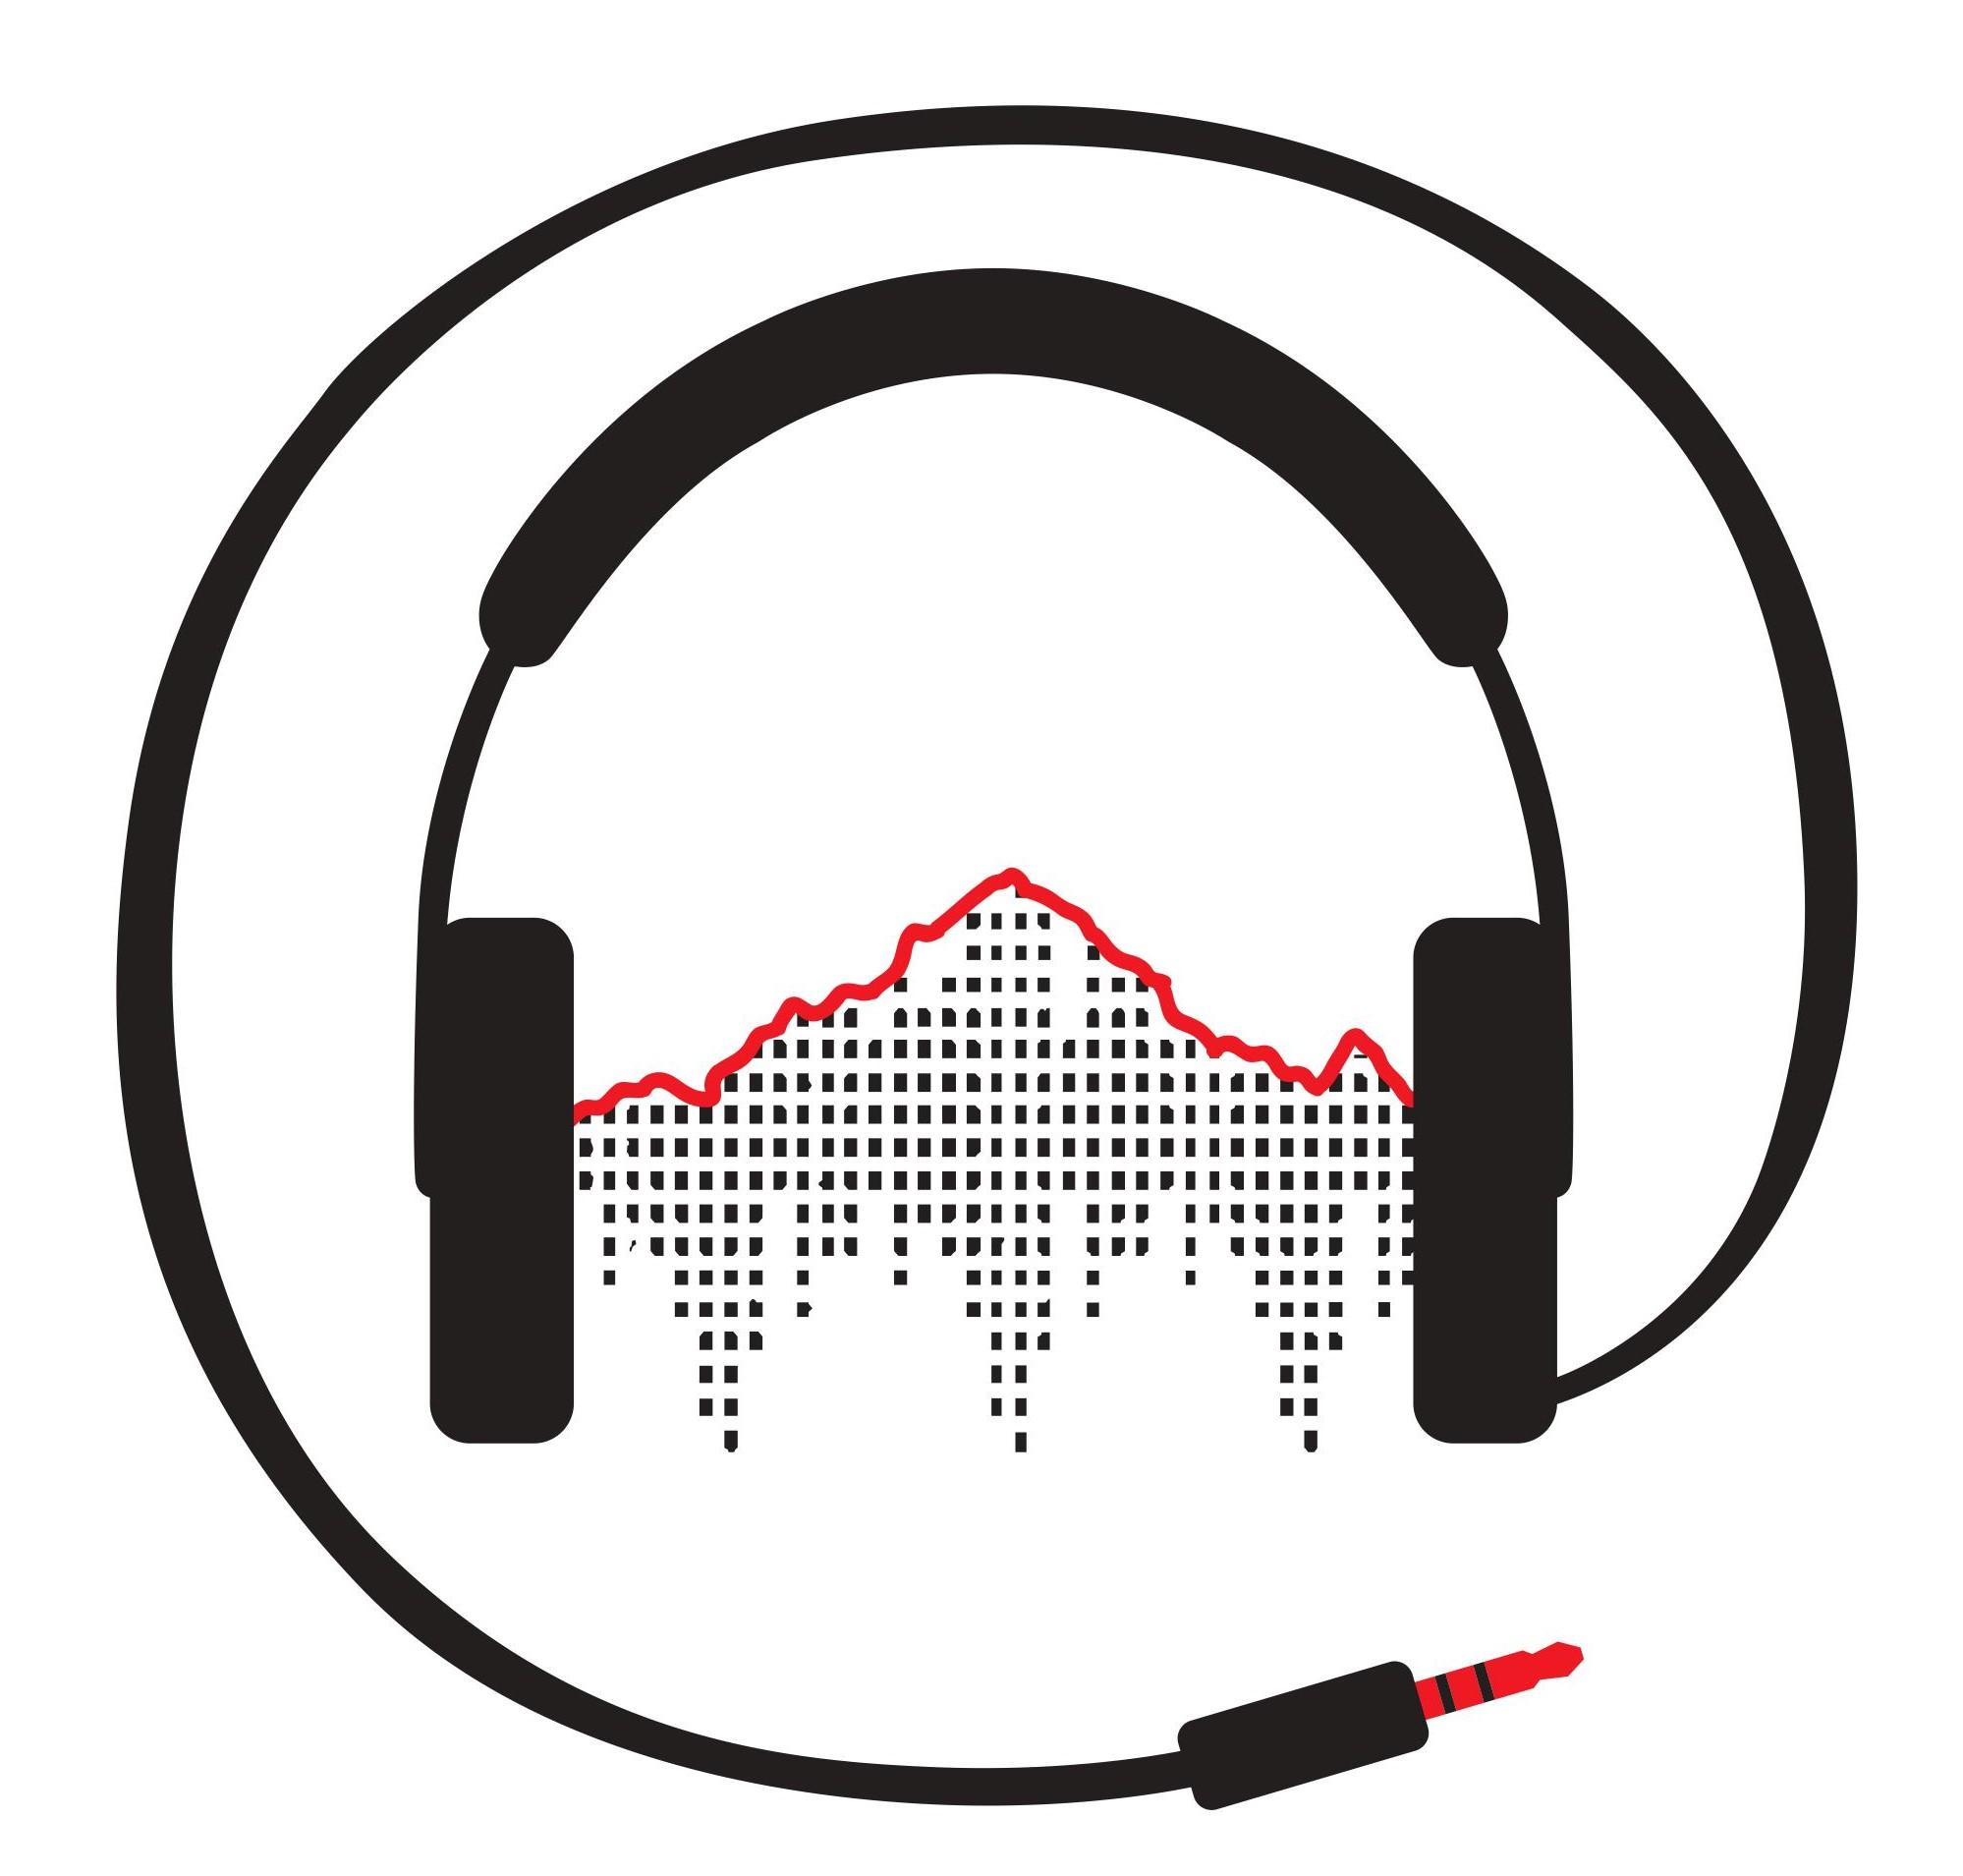 Pinerolwebradio